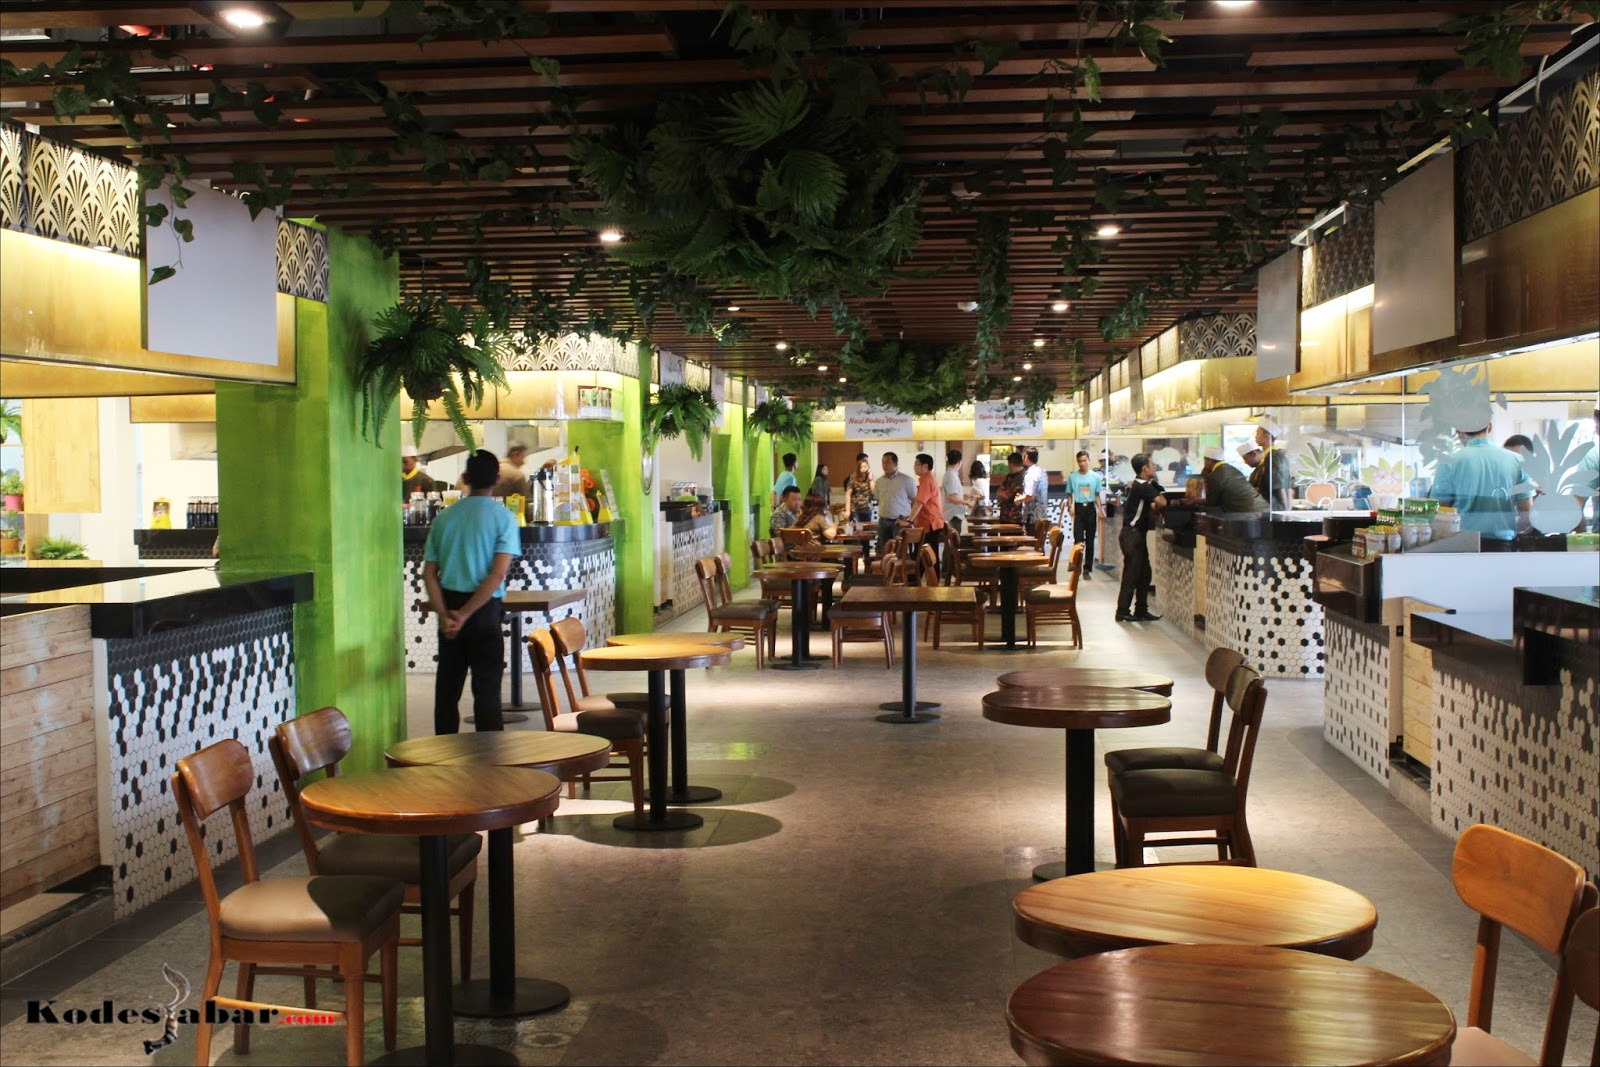 Greko Creative Hub Tempat Berinovasi Usaha Kreatif Dan